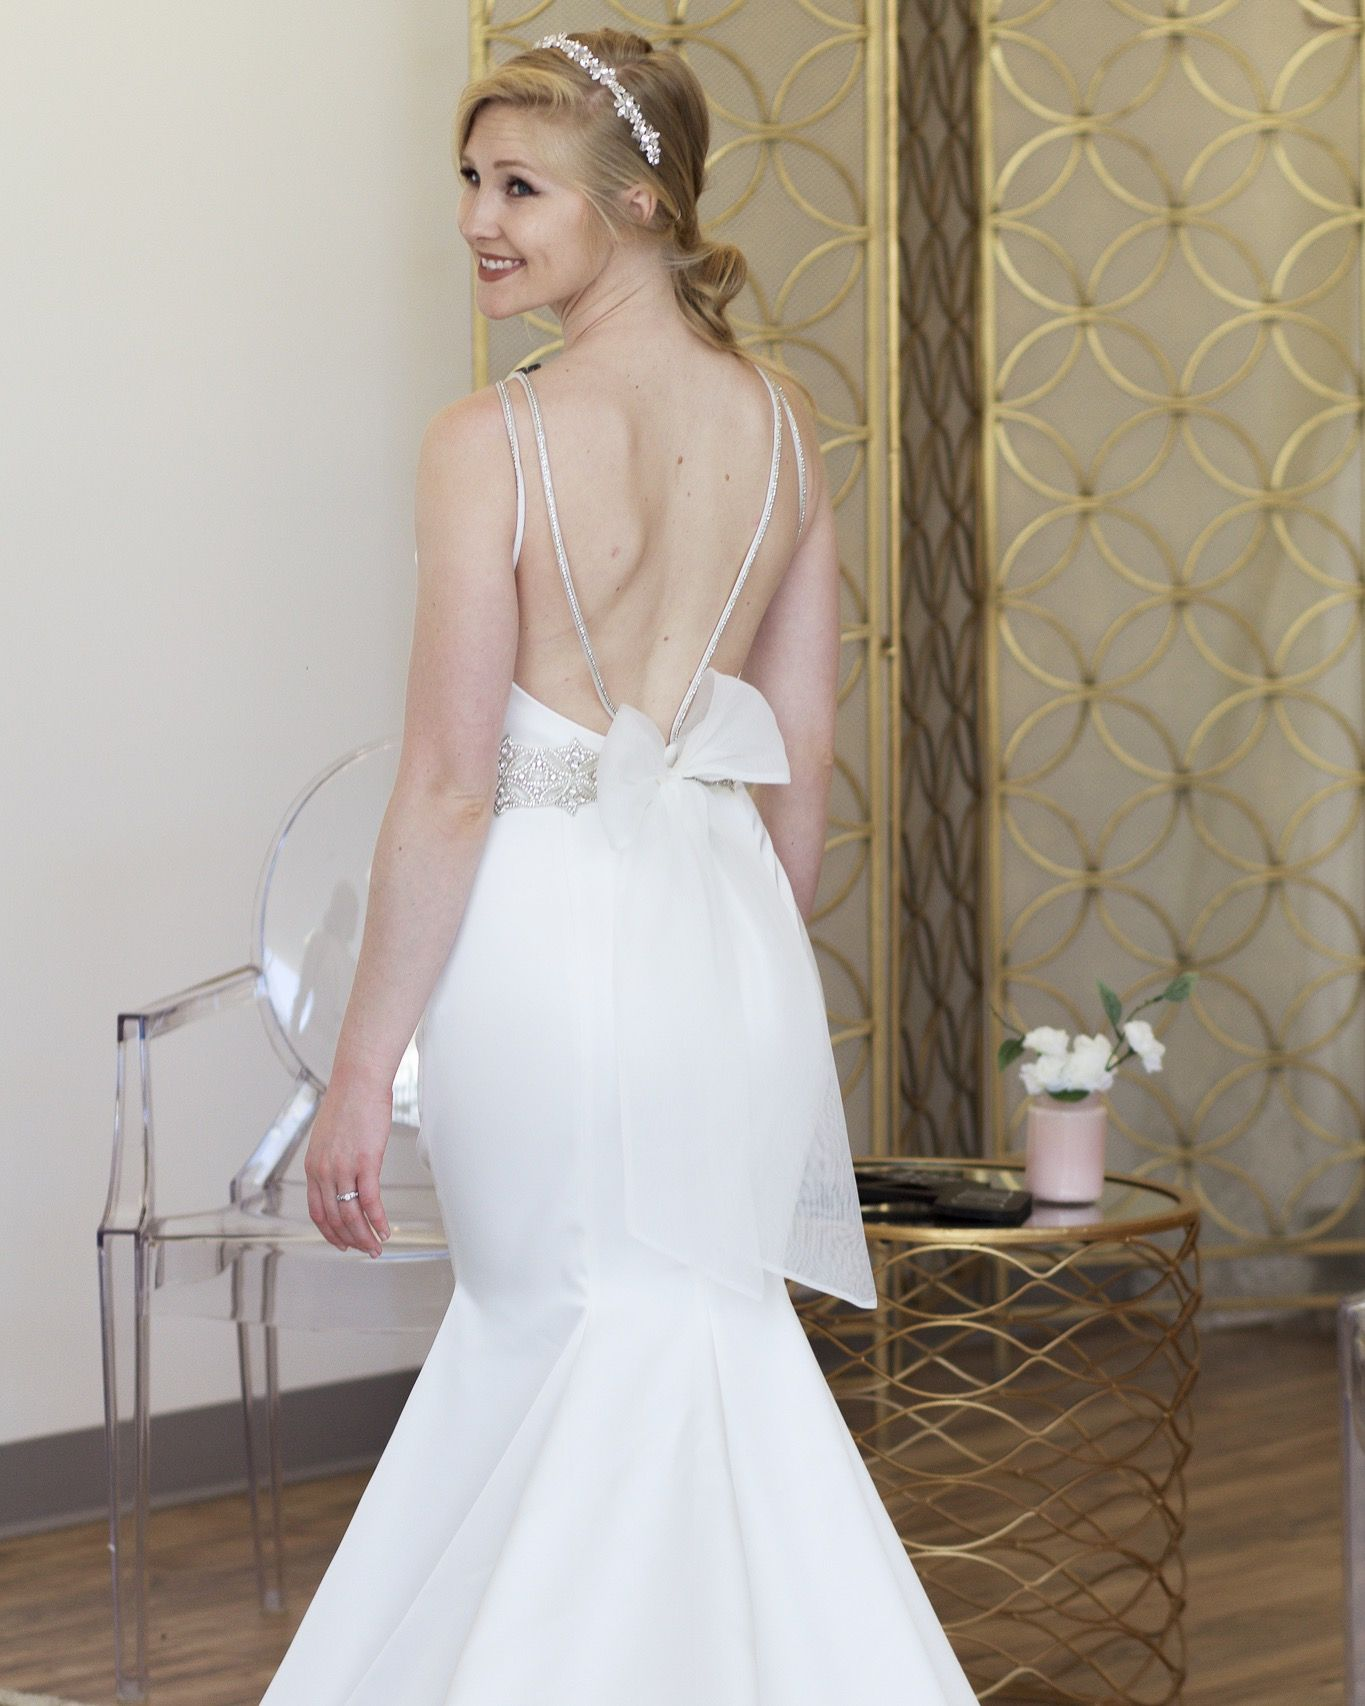 Beautiful Paloma Blanca Mermaid Bridal Gown In Glendale Az